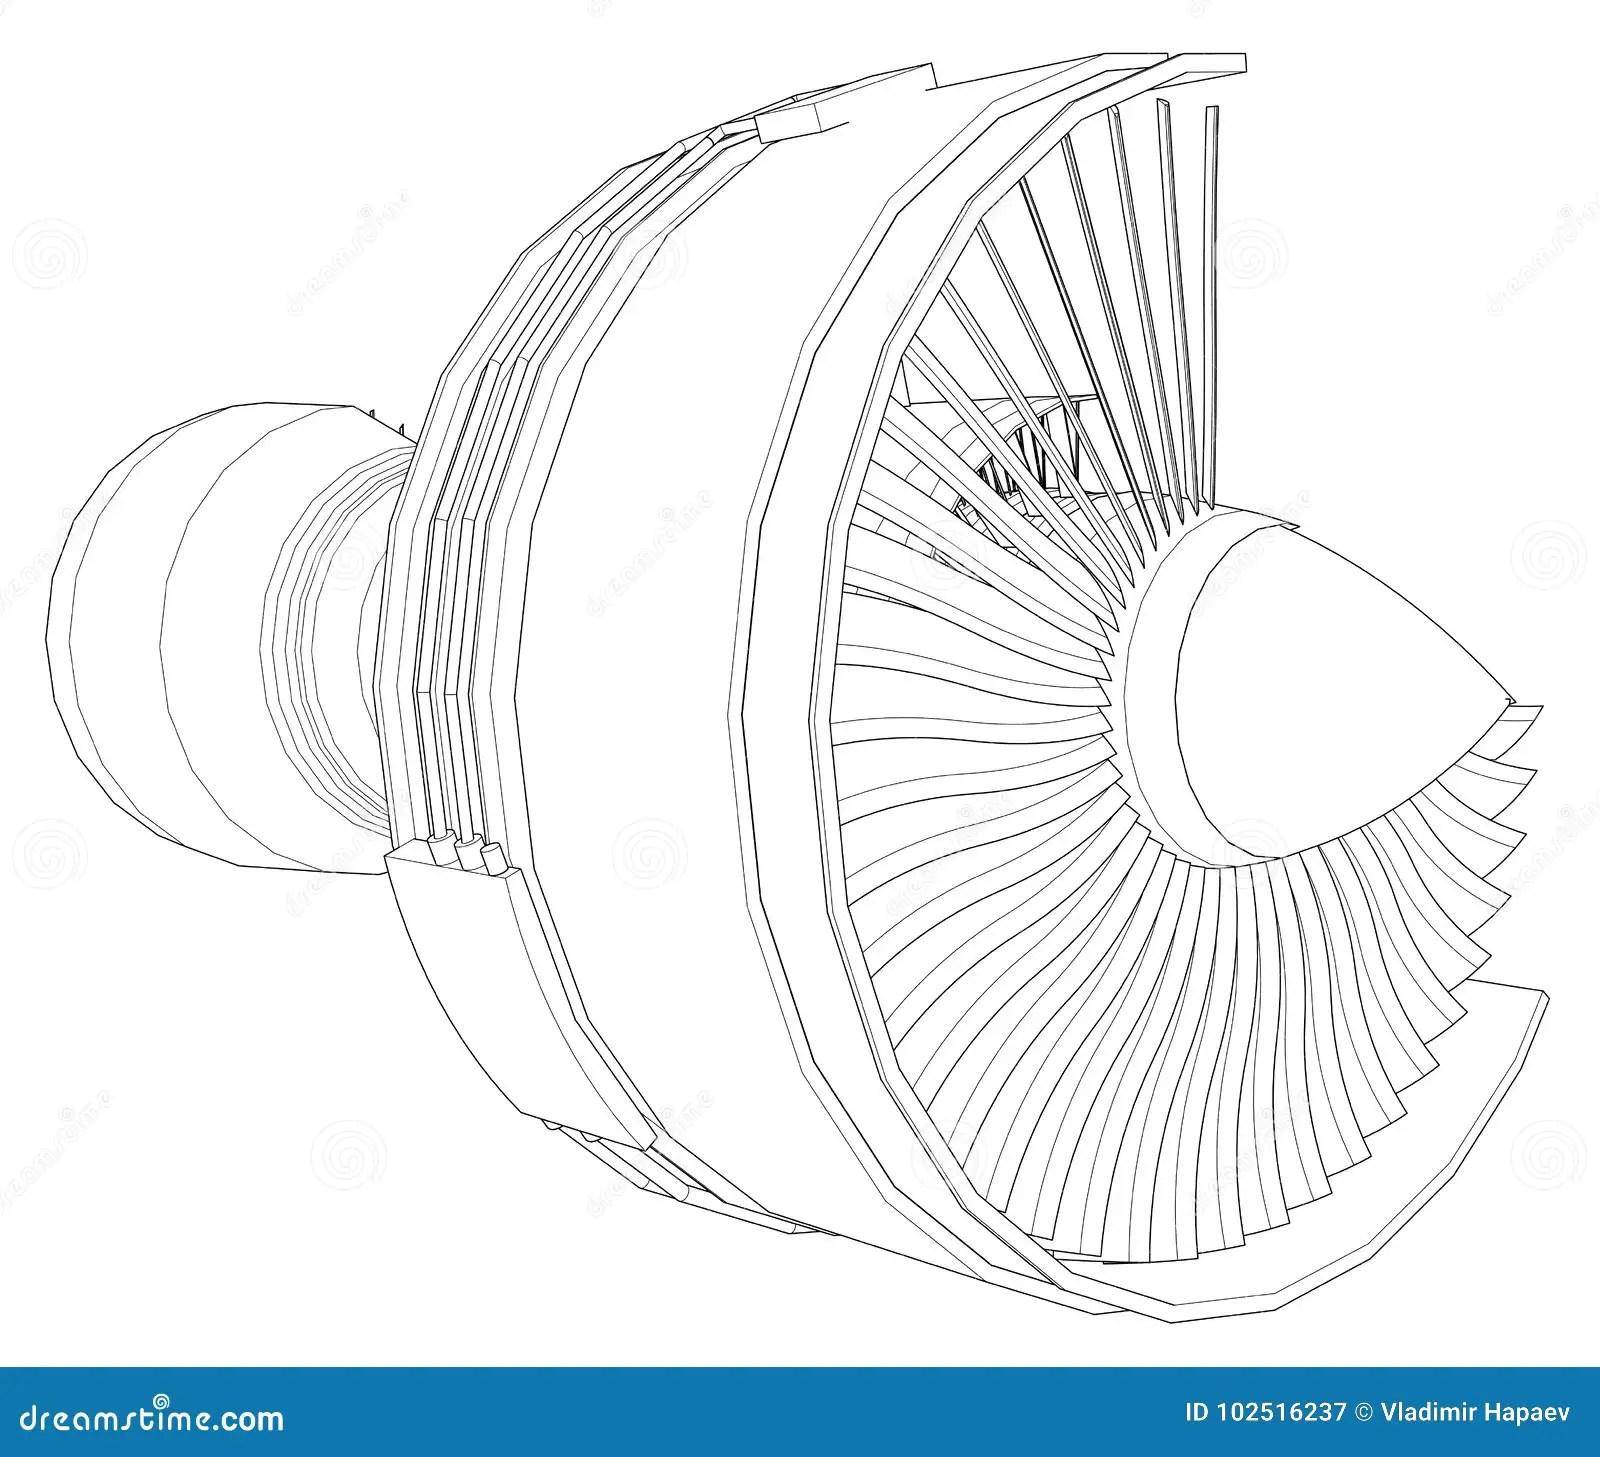 Airplane Engine Turbo Spooling